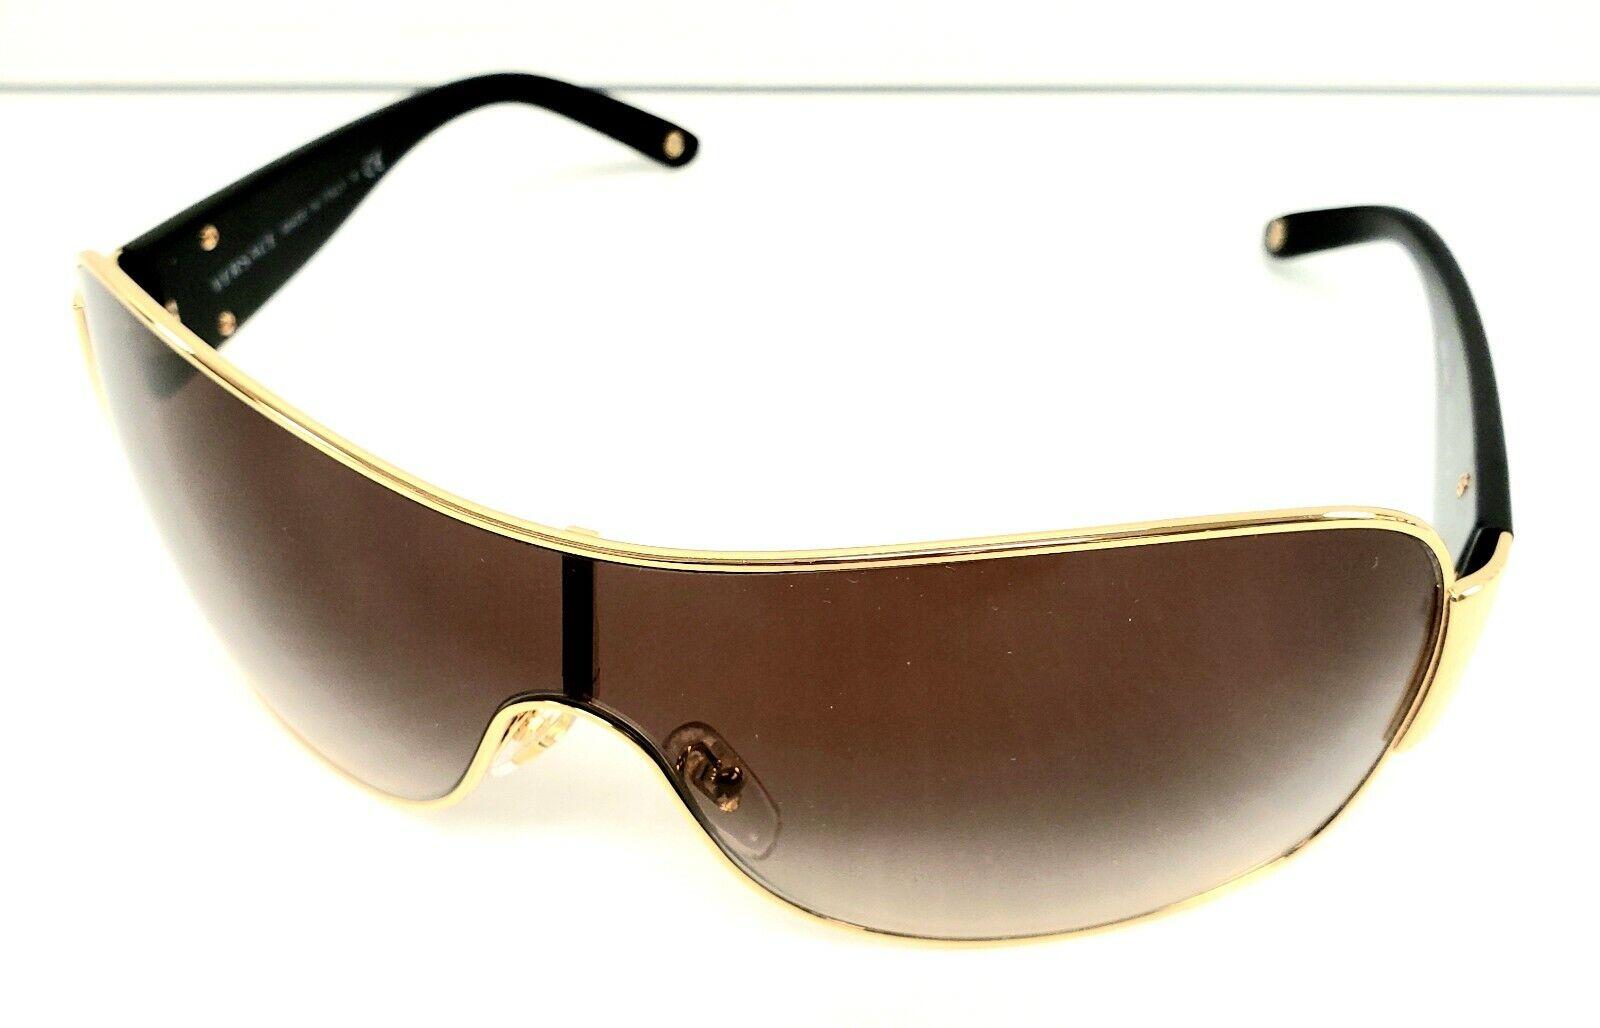 (I-6408) Coach Tortoise Sunglasses